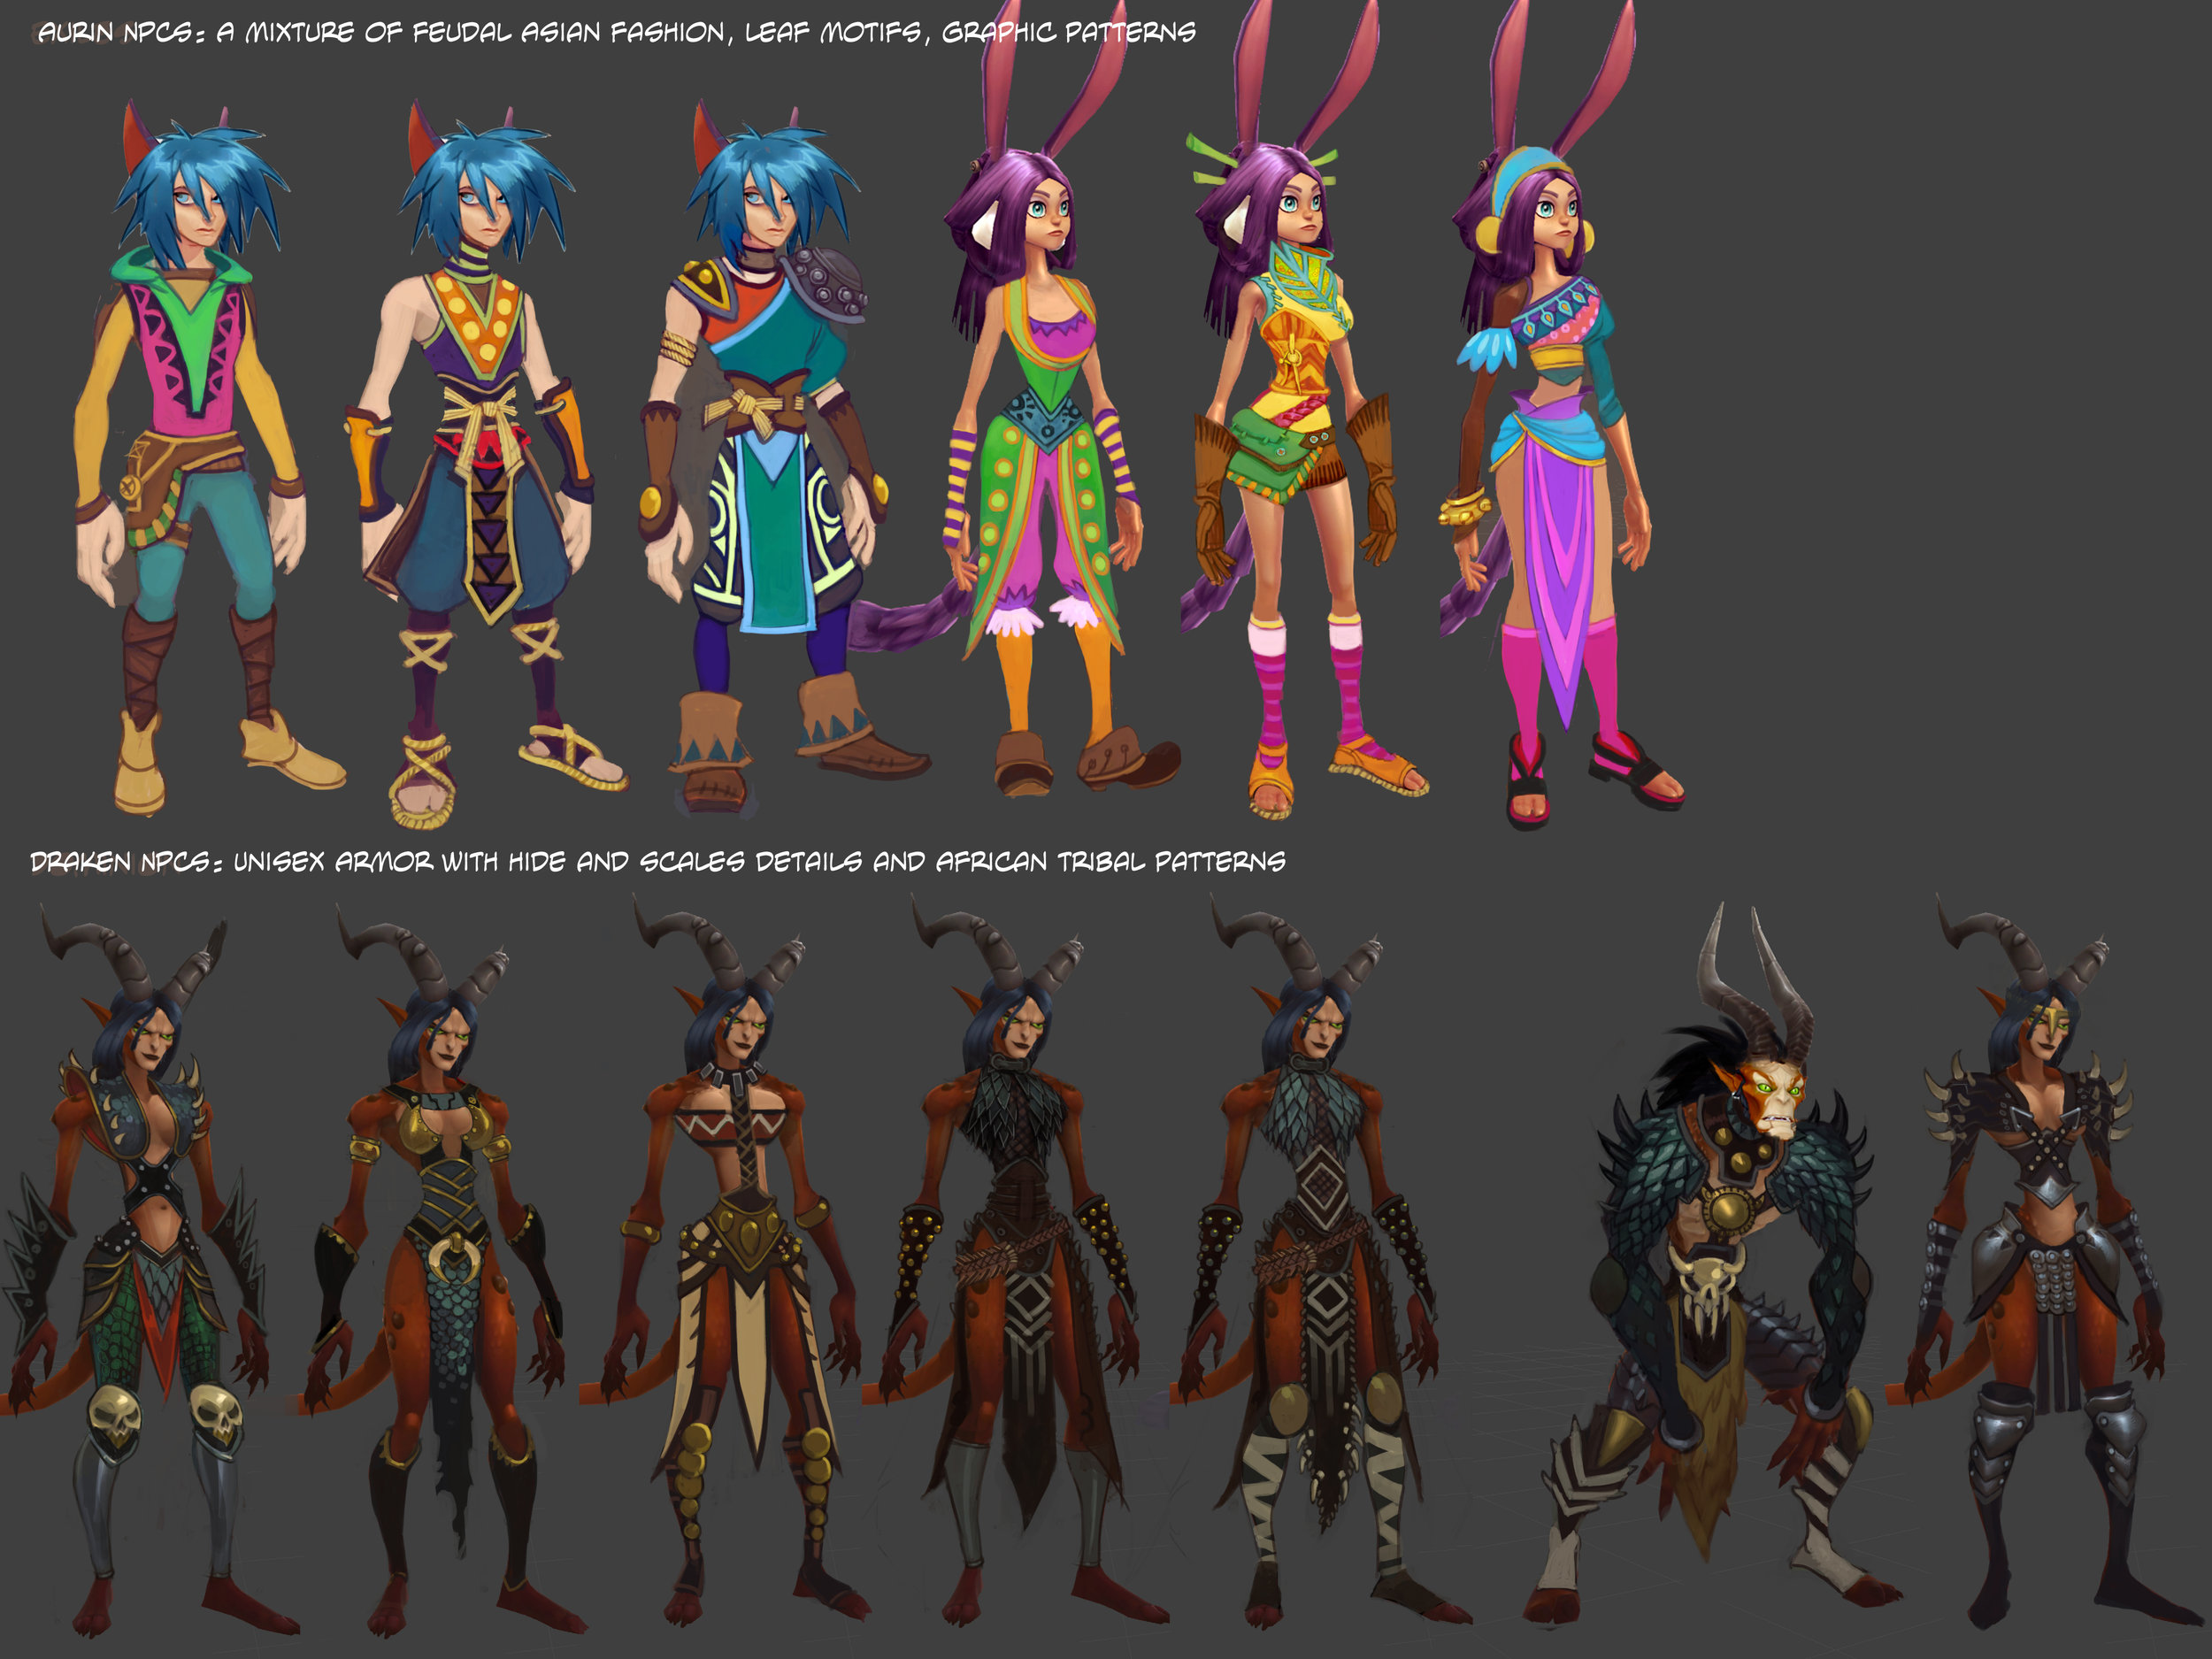 Wildstar_Character_factions_ipad_02.jpg